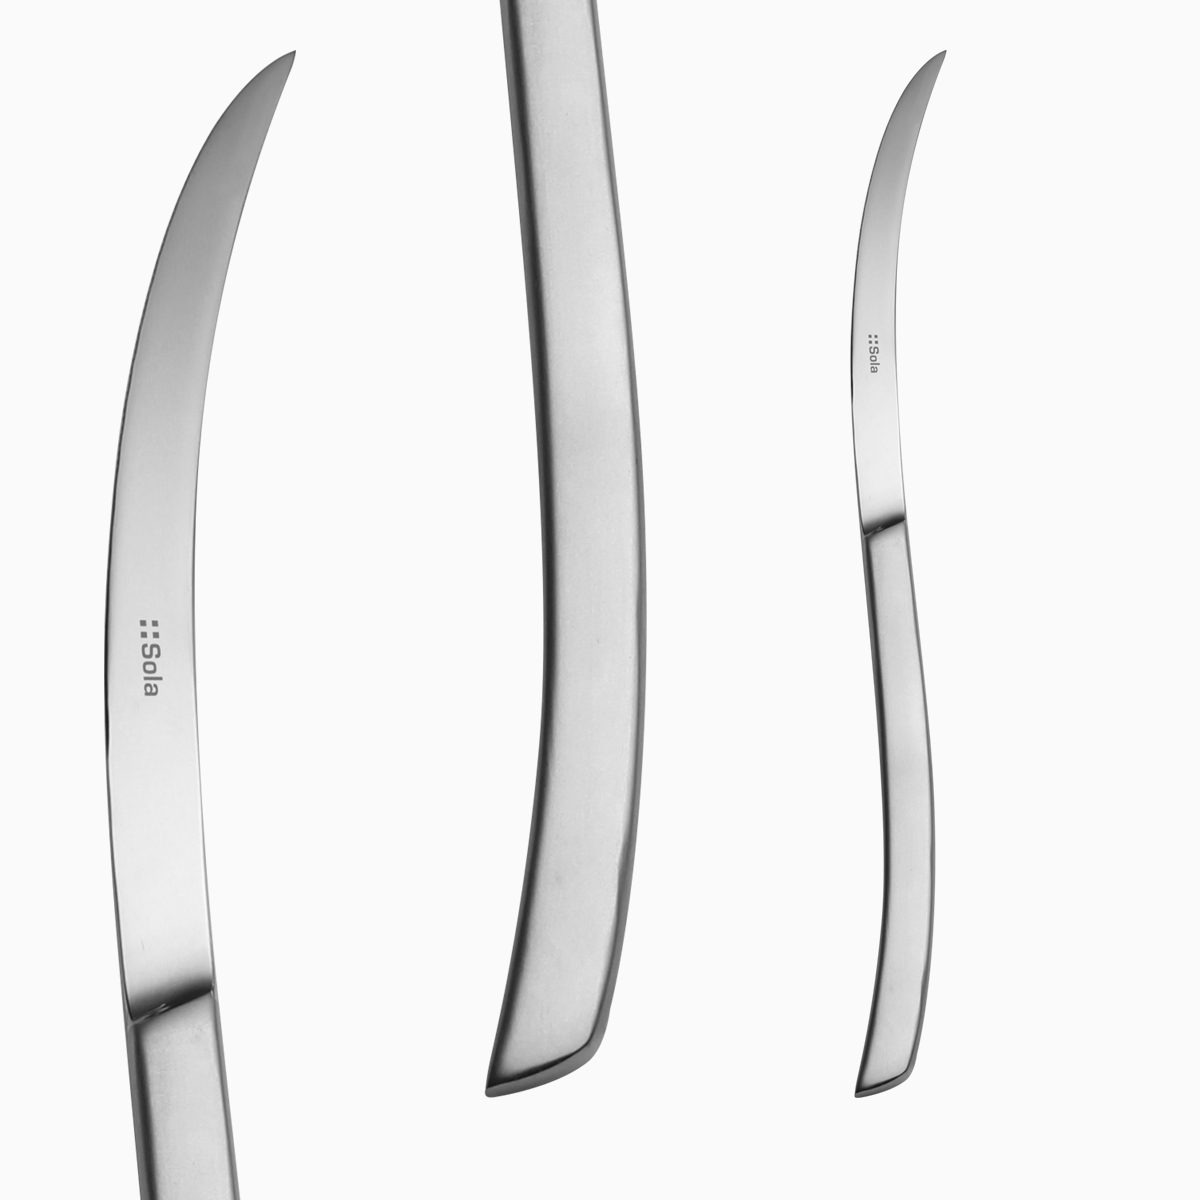 Table knife - Avantgarde Elite Quarz